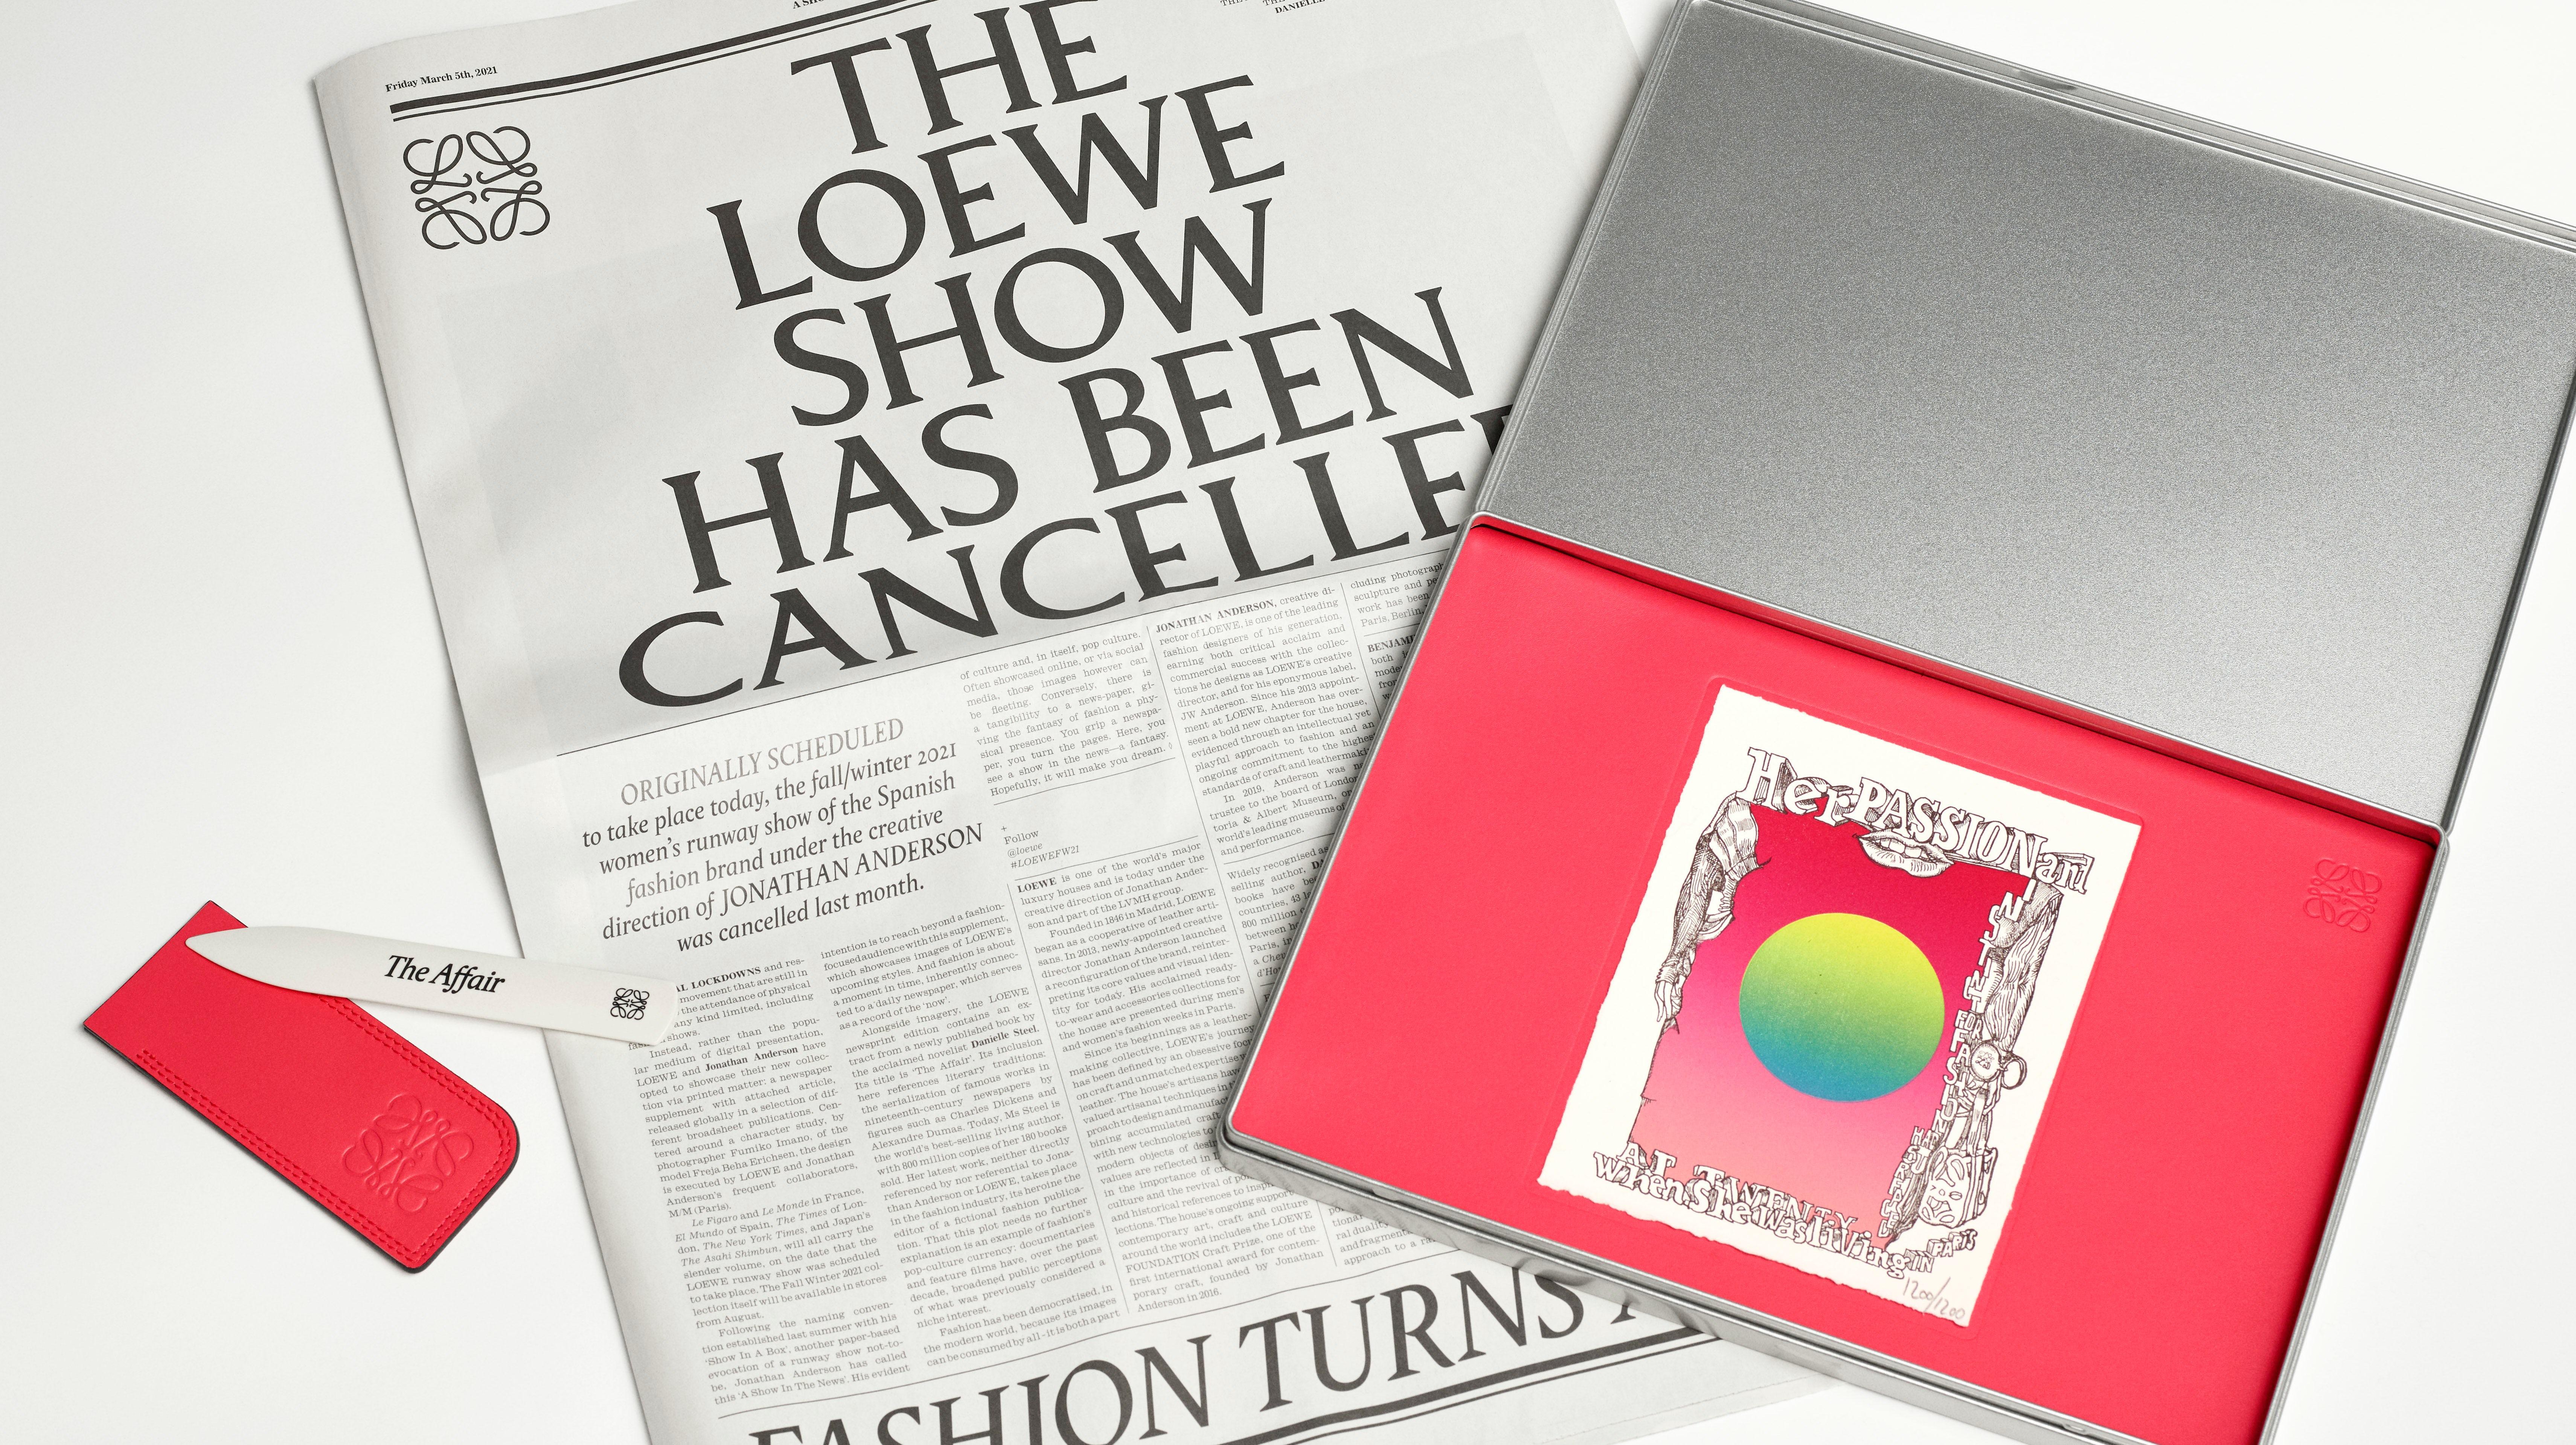 Loewe's Show in the News. Loewe.